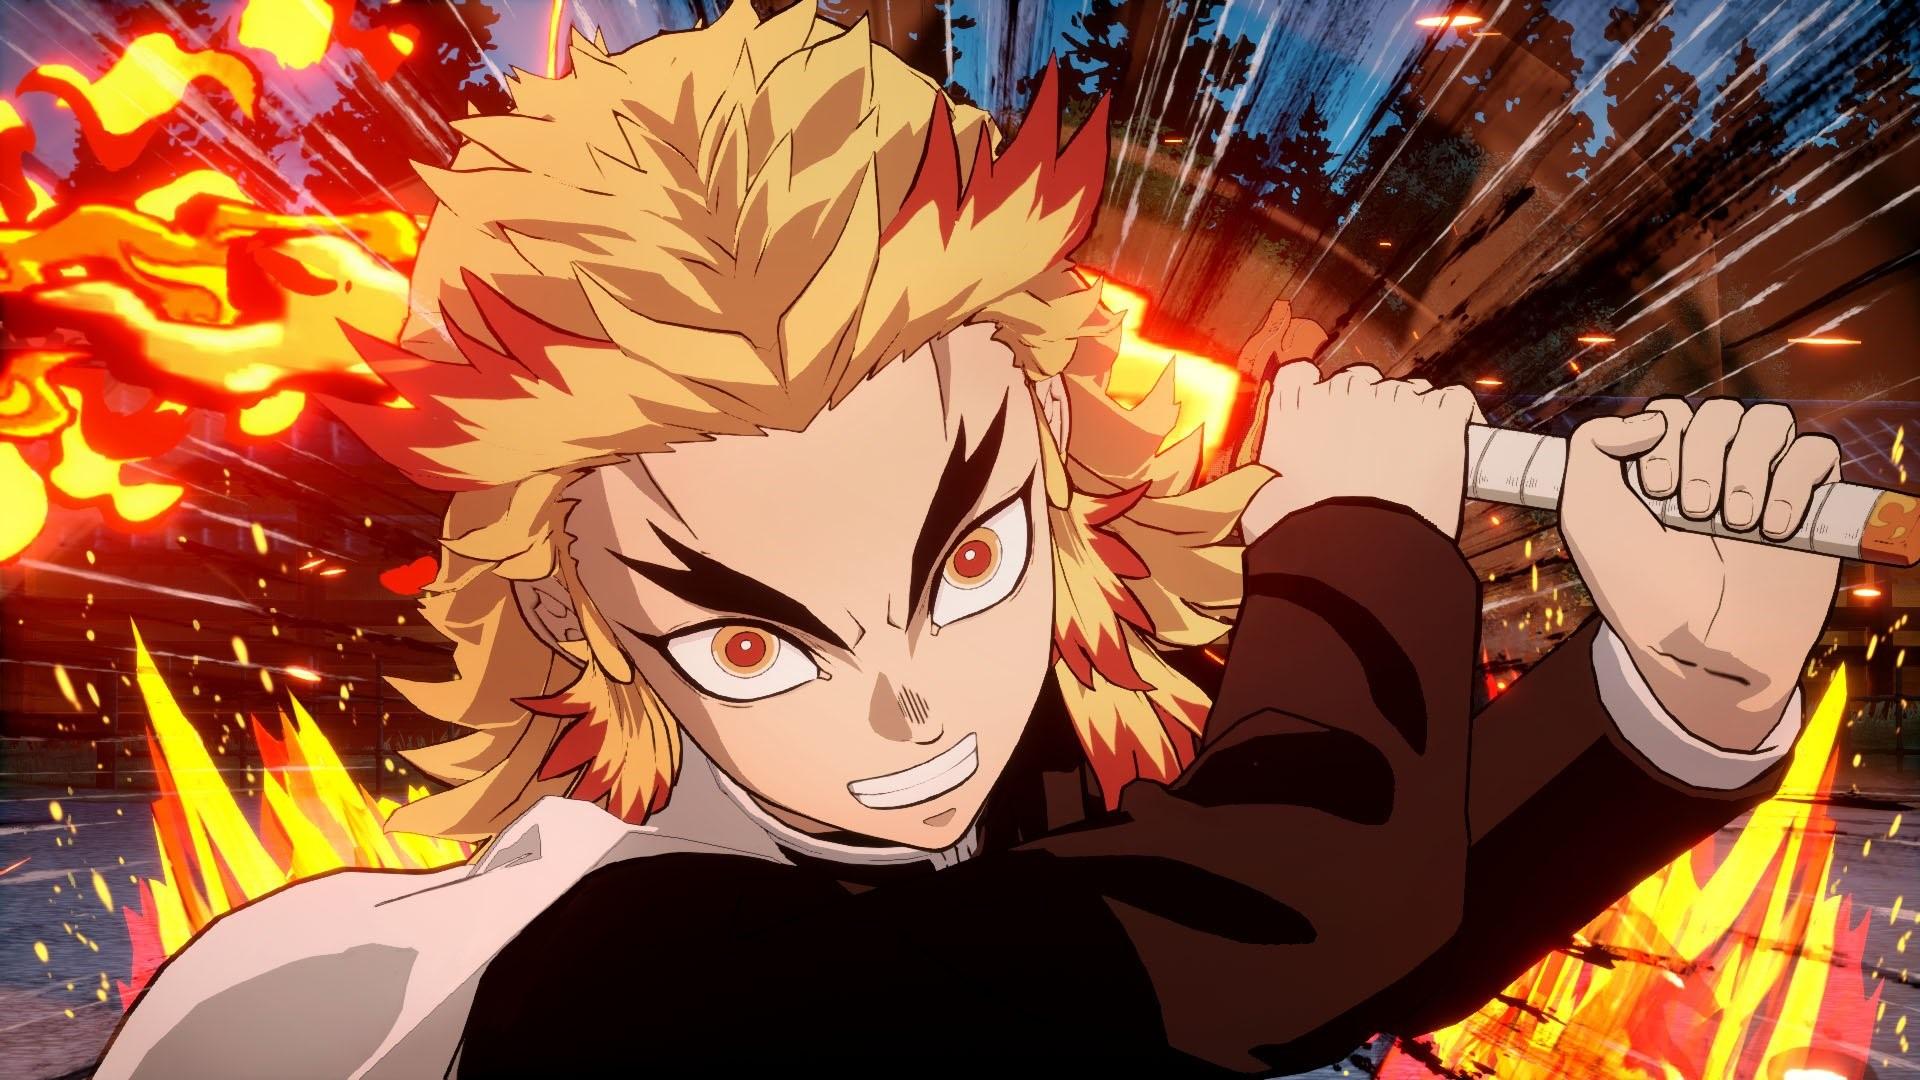 Demon Slayer -Kimetsu no Yaiba- The Hinokami Chronicles coming to North America on October 15 - Featured